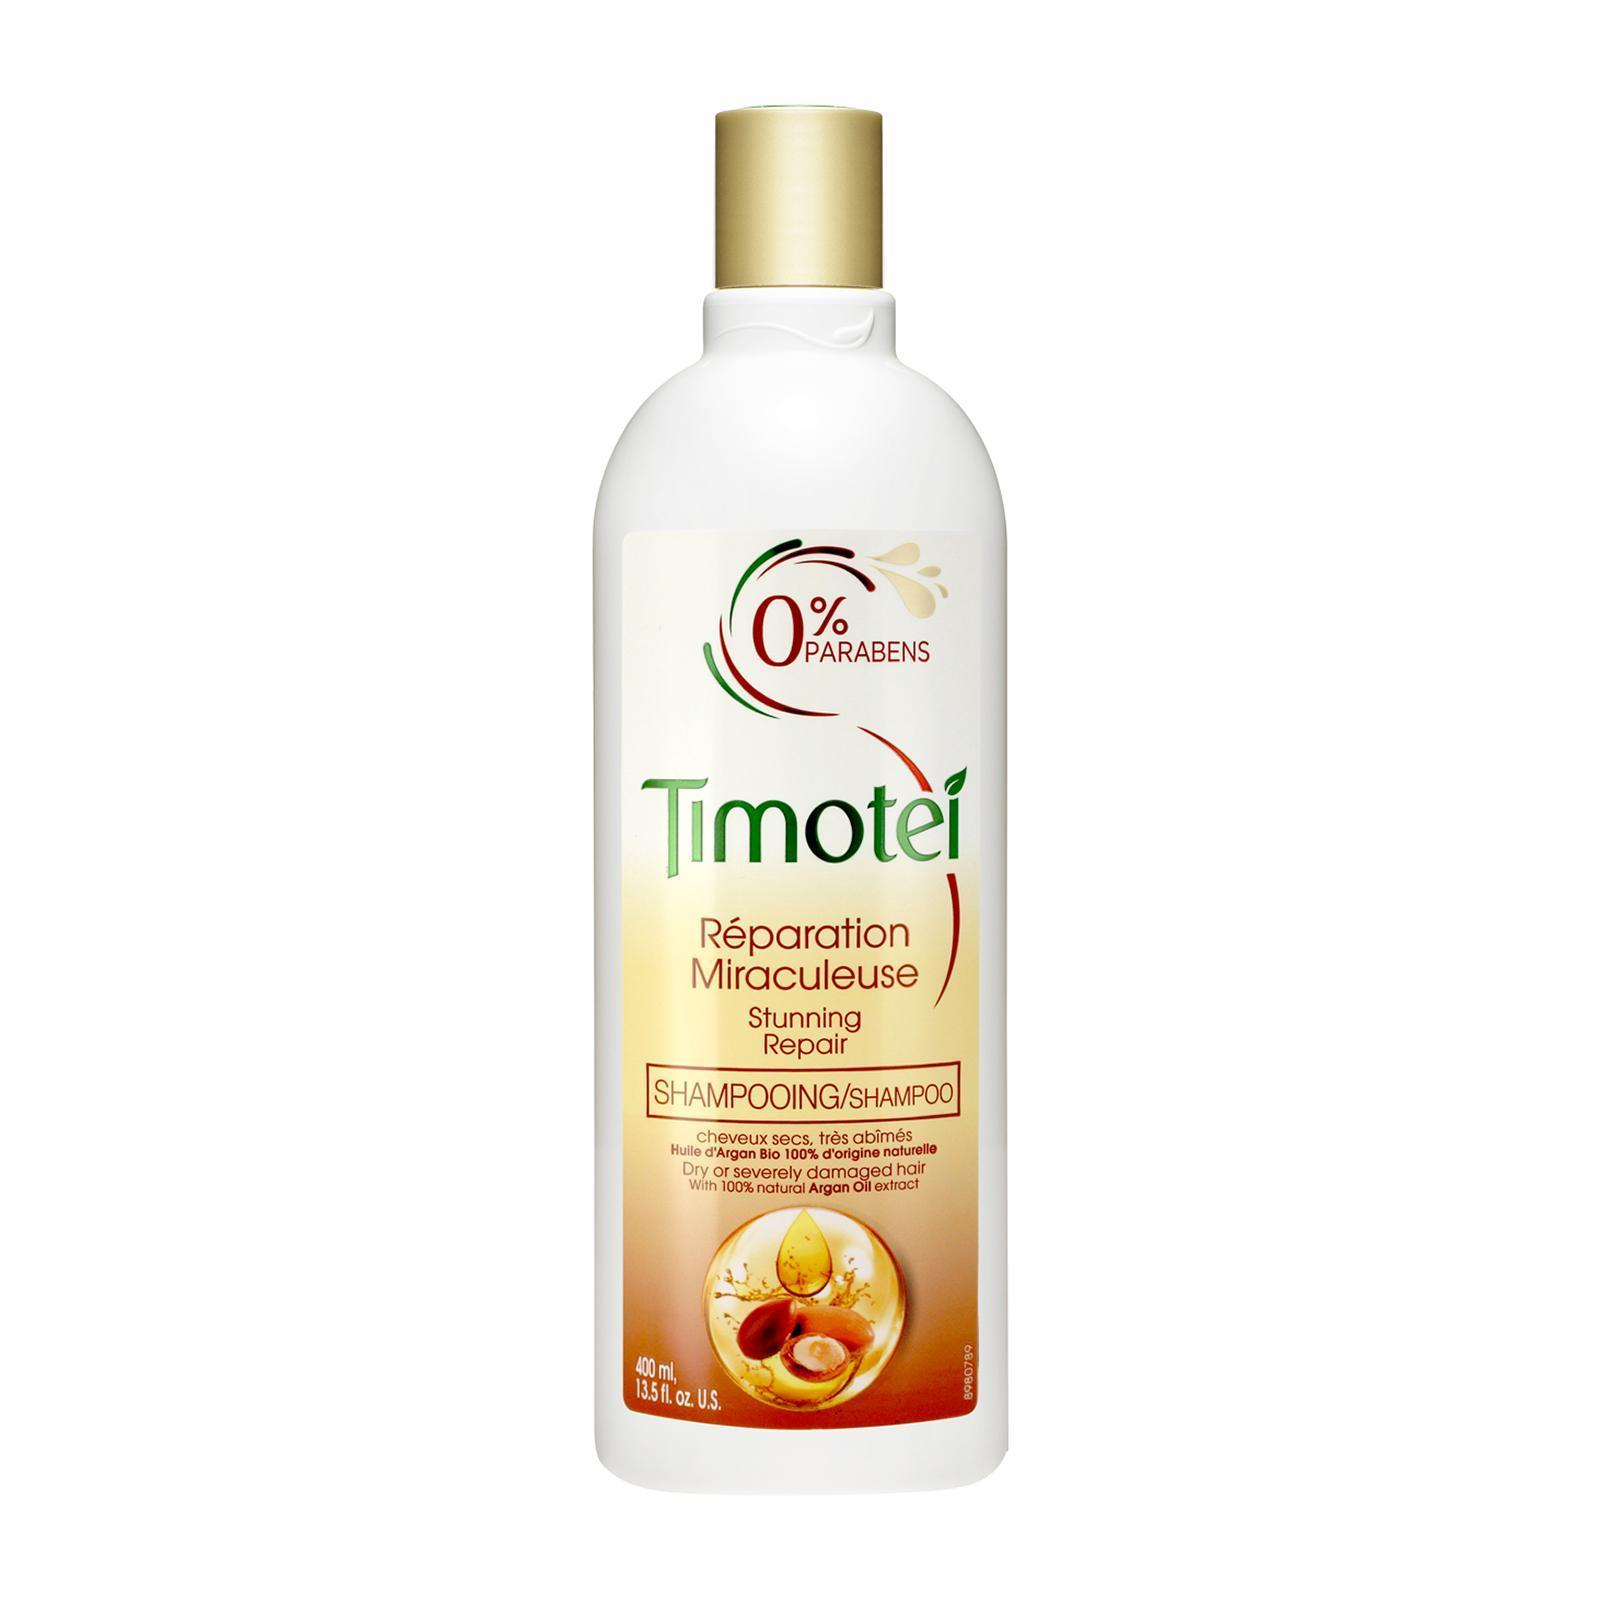 Timotei Stunning Repair Shampoo